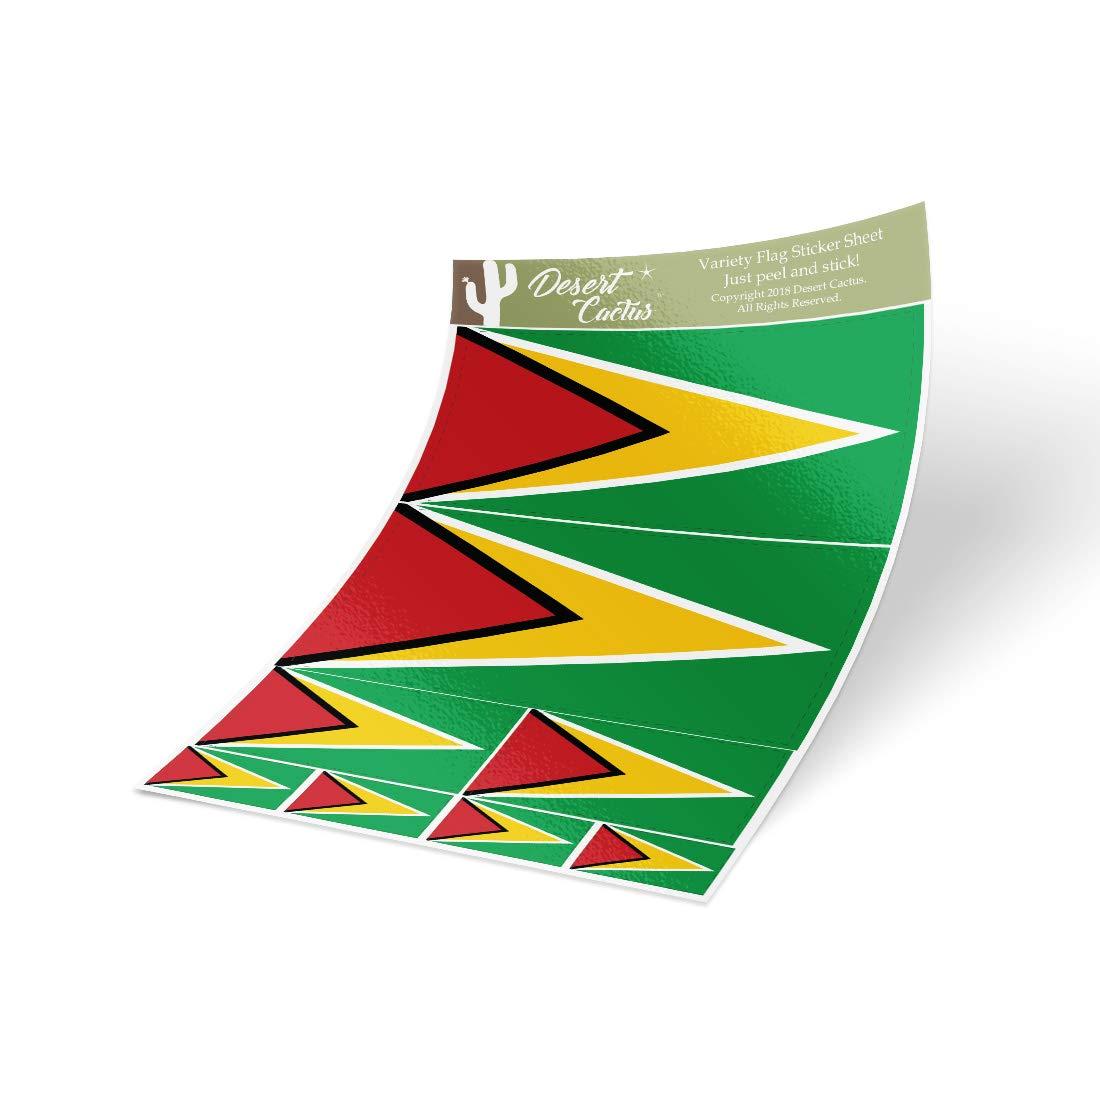 Desert Cactus Guyana Country Flag Sticker Decal Variety Size Pack 8 Total Pieces Kids Logo Scrapbook Car Vinyl Window Bumper Laptop V